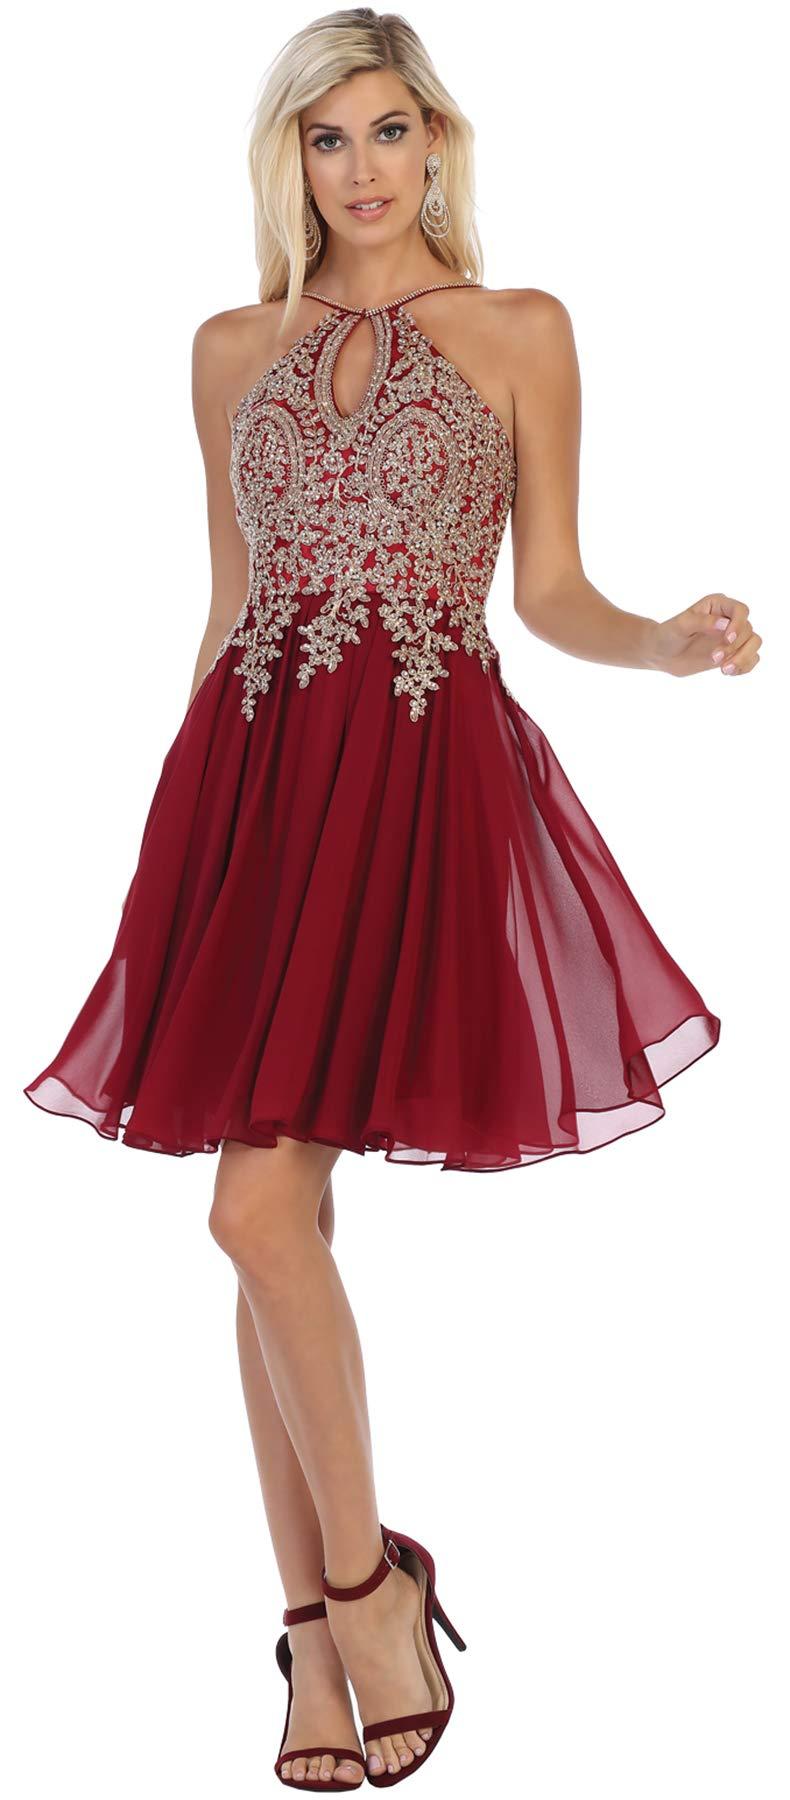 Formal Dress Shops Inc Fds1646 Semi Formal Dance Classy Short Dress